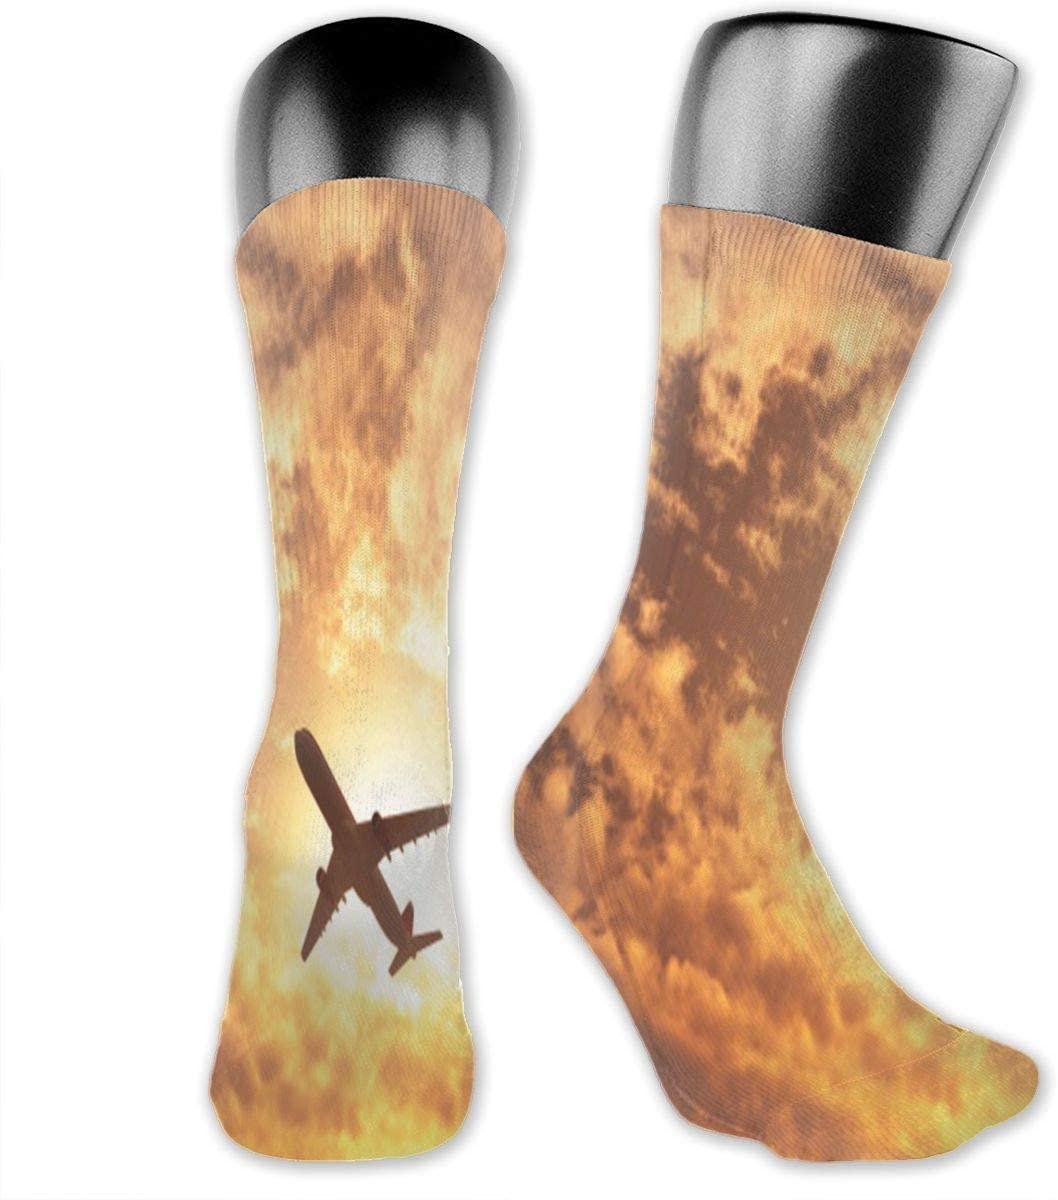 Plane Passing by The Sun Unisex Outdoor Long Socks Sport Athletic Crew Socks Stockings